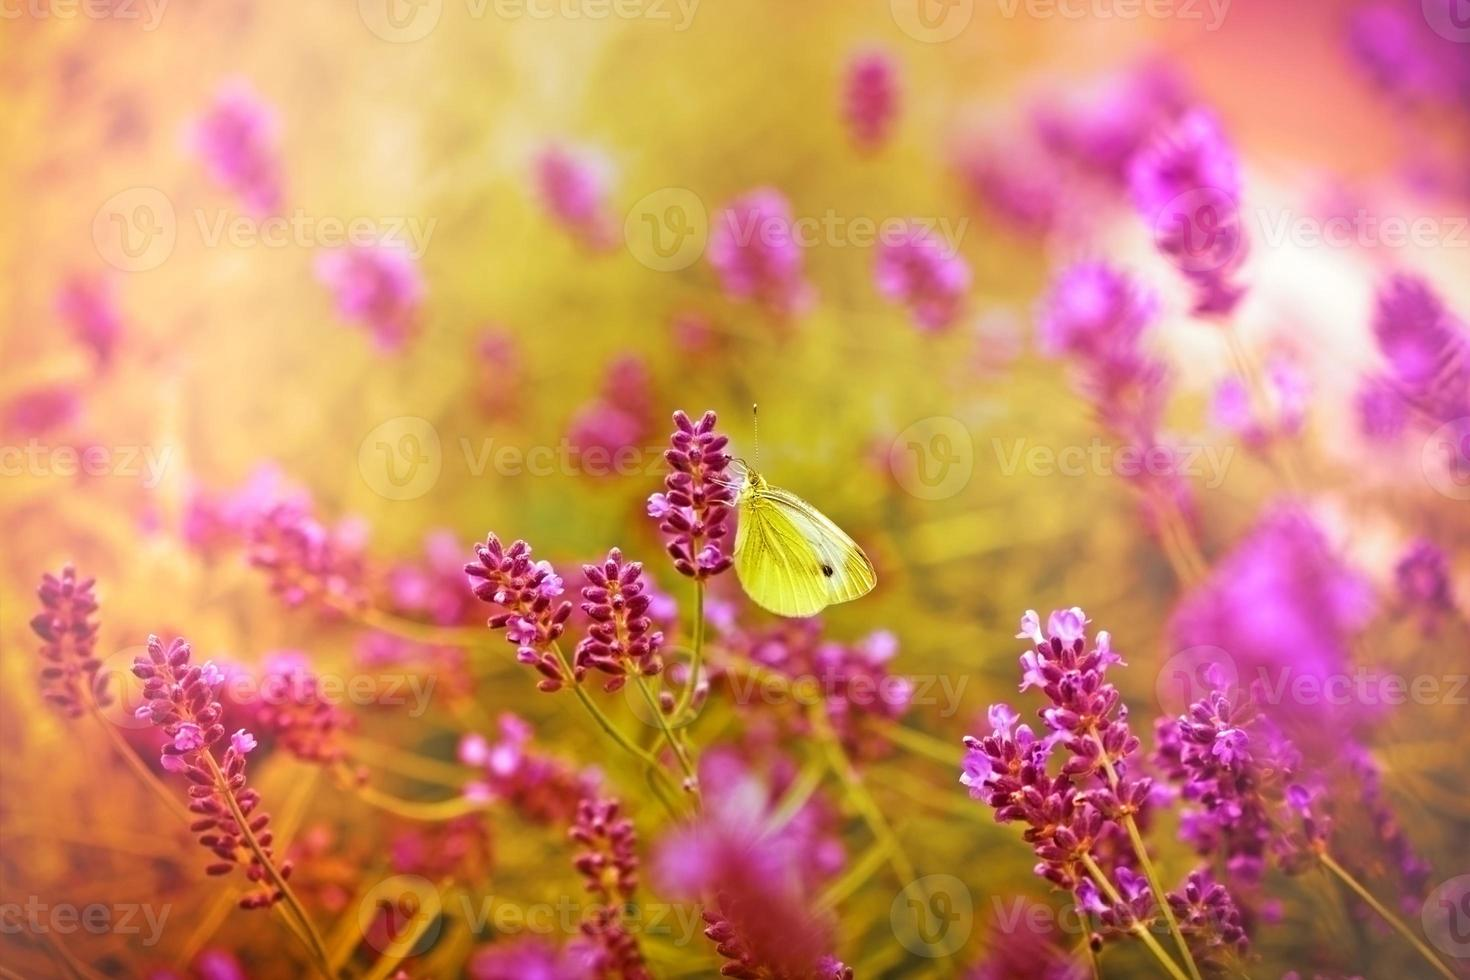 borboleta branca em uma linda lavanda foto